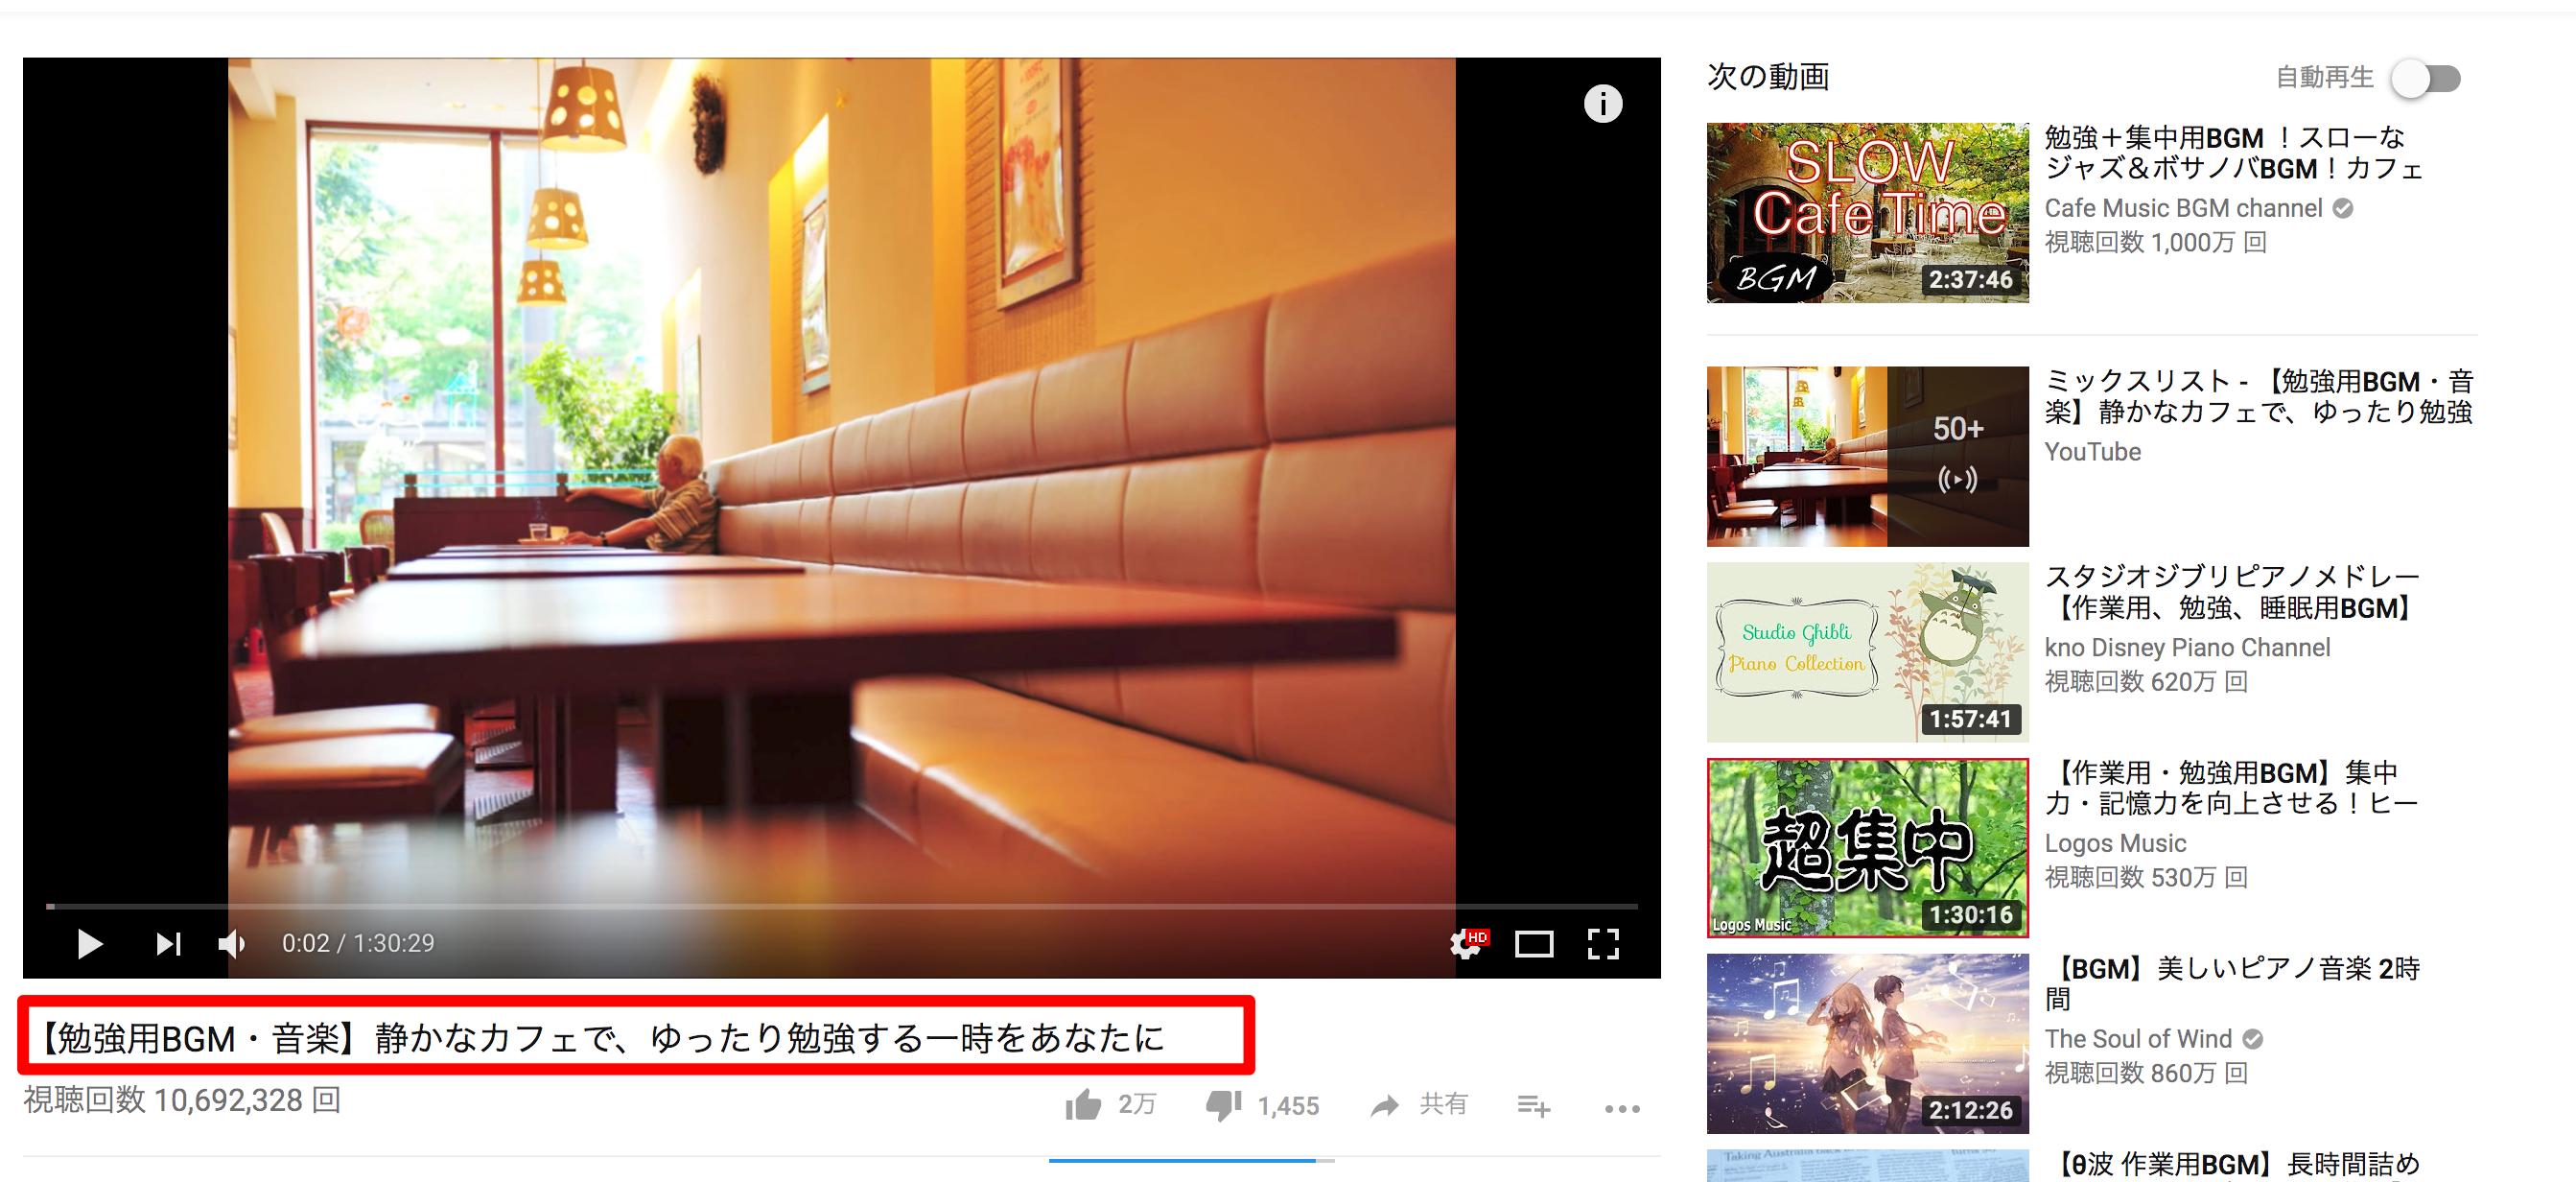 YouTubeで稼ぐ方法動画SEO対策5